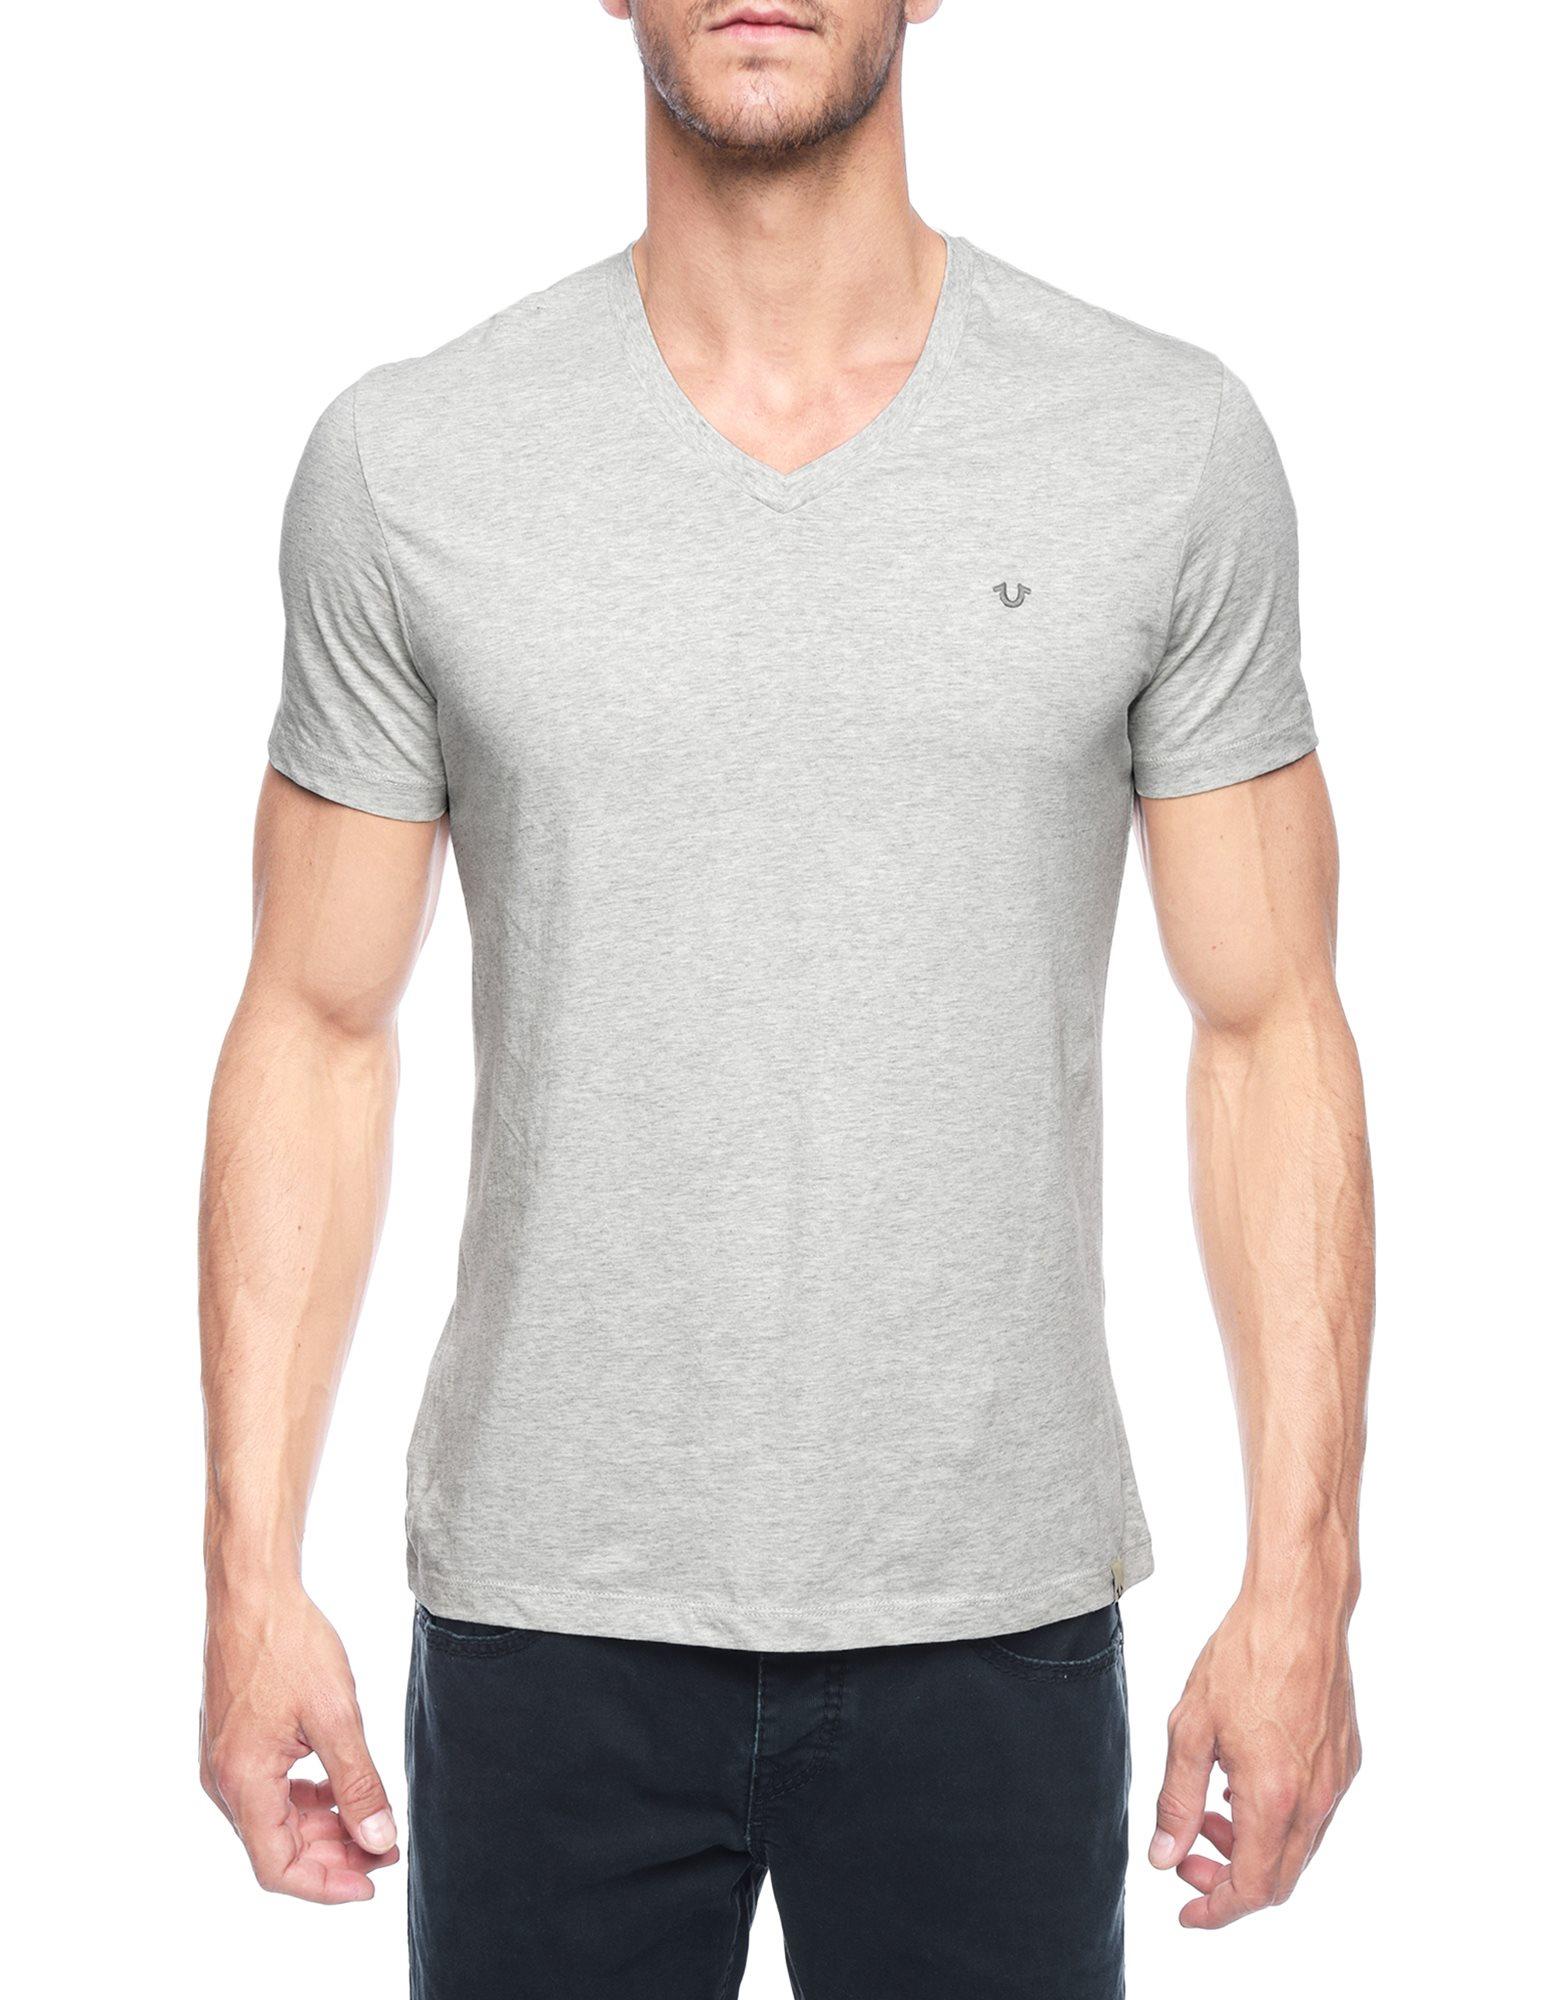 True religion heather v neck mens t shirt in gray for men Mens heather grey t shirt